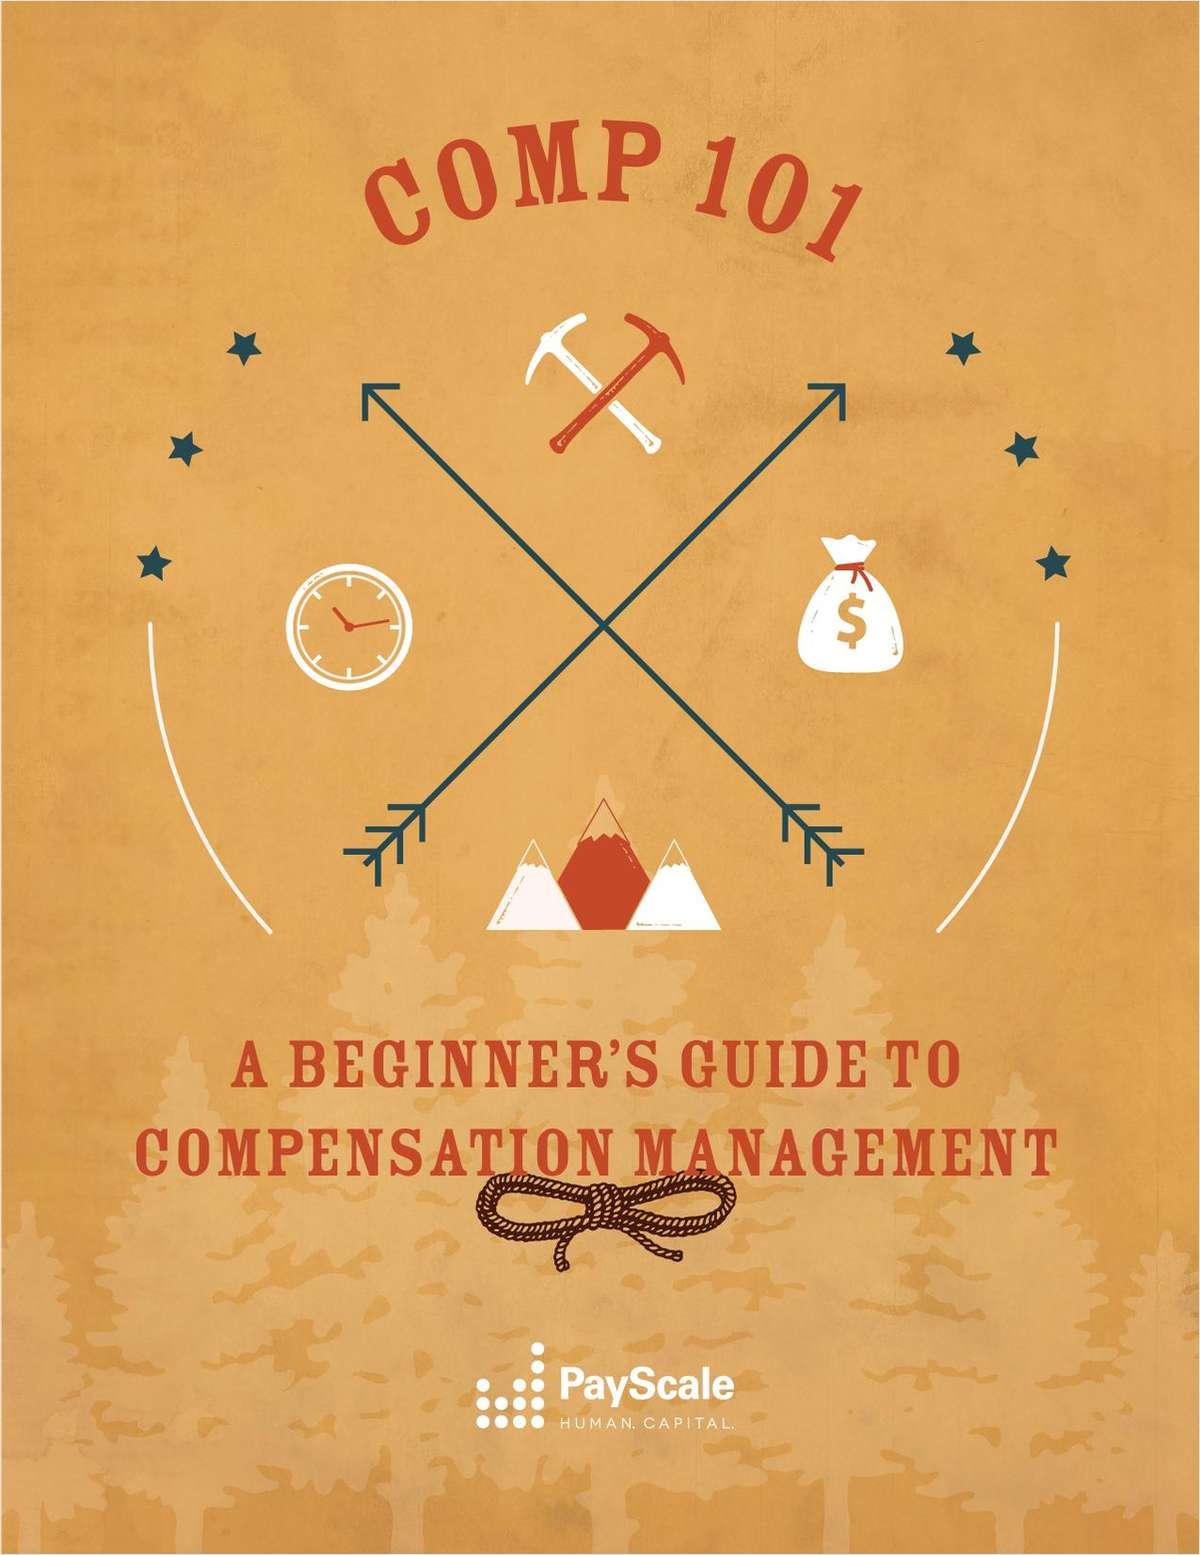 Compensation 101: A Beginner's Guide to Compensation Management